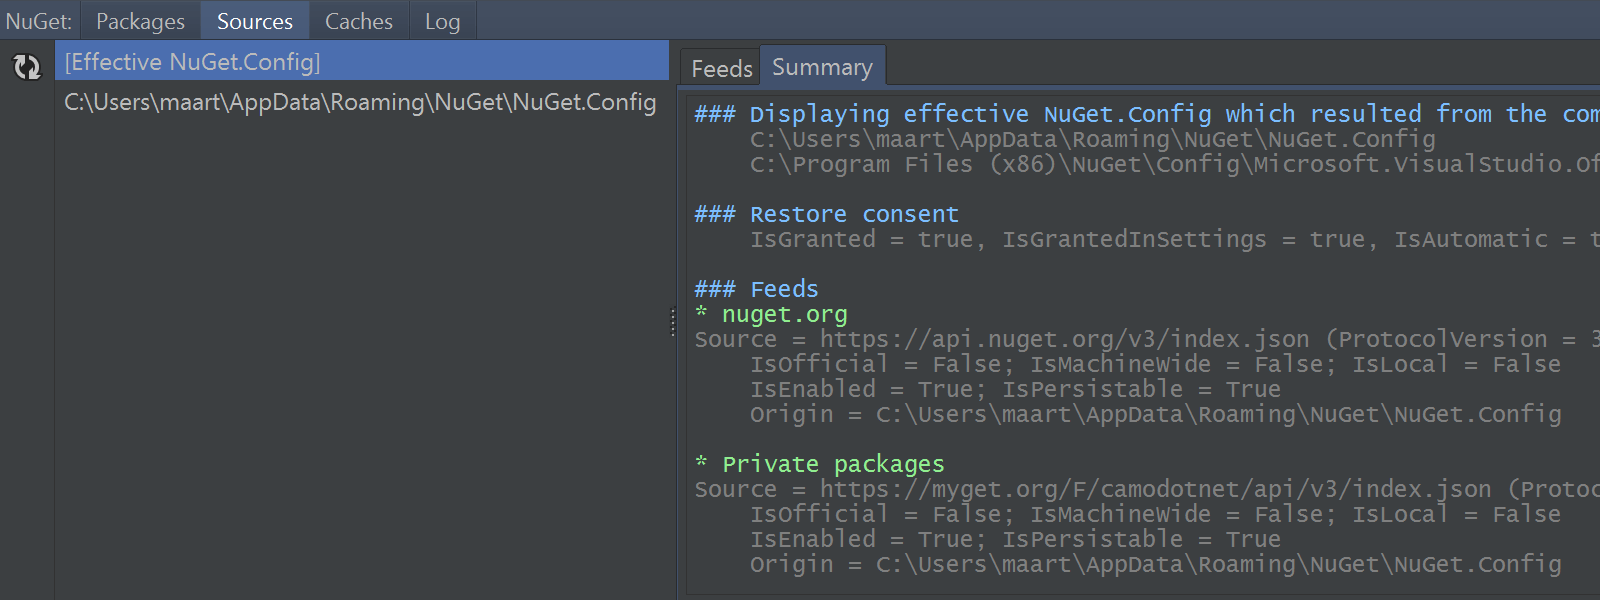 Effective NuGet configuration